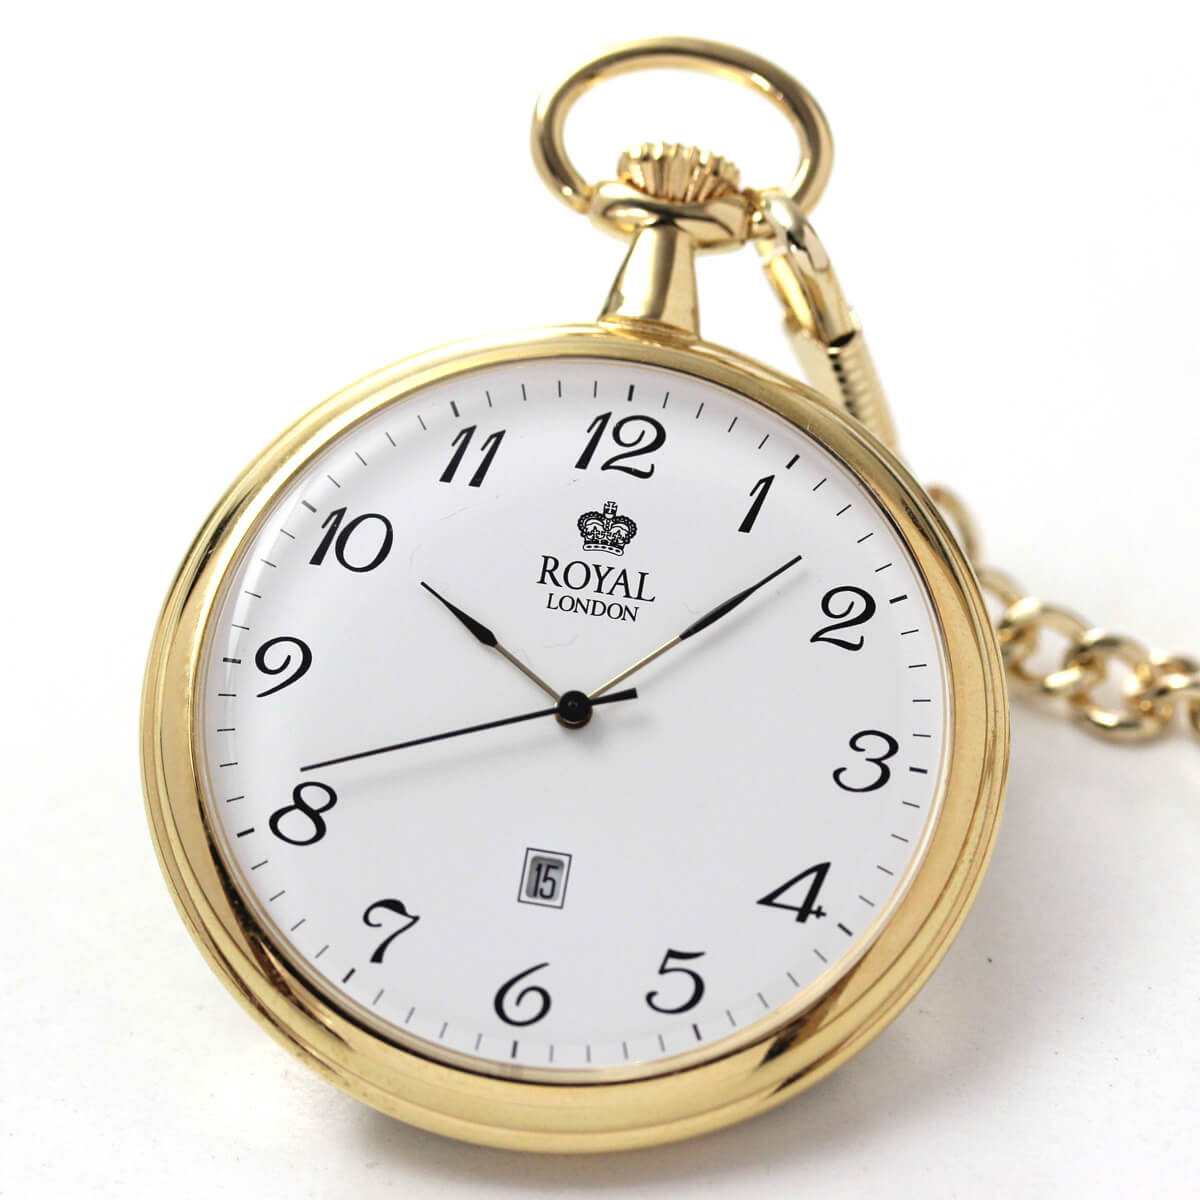 ROYAL LONDON(ロイヤルロンドン) クォーツ懐中時計 90015-02